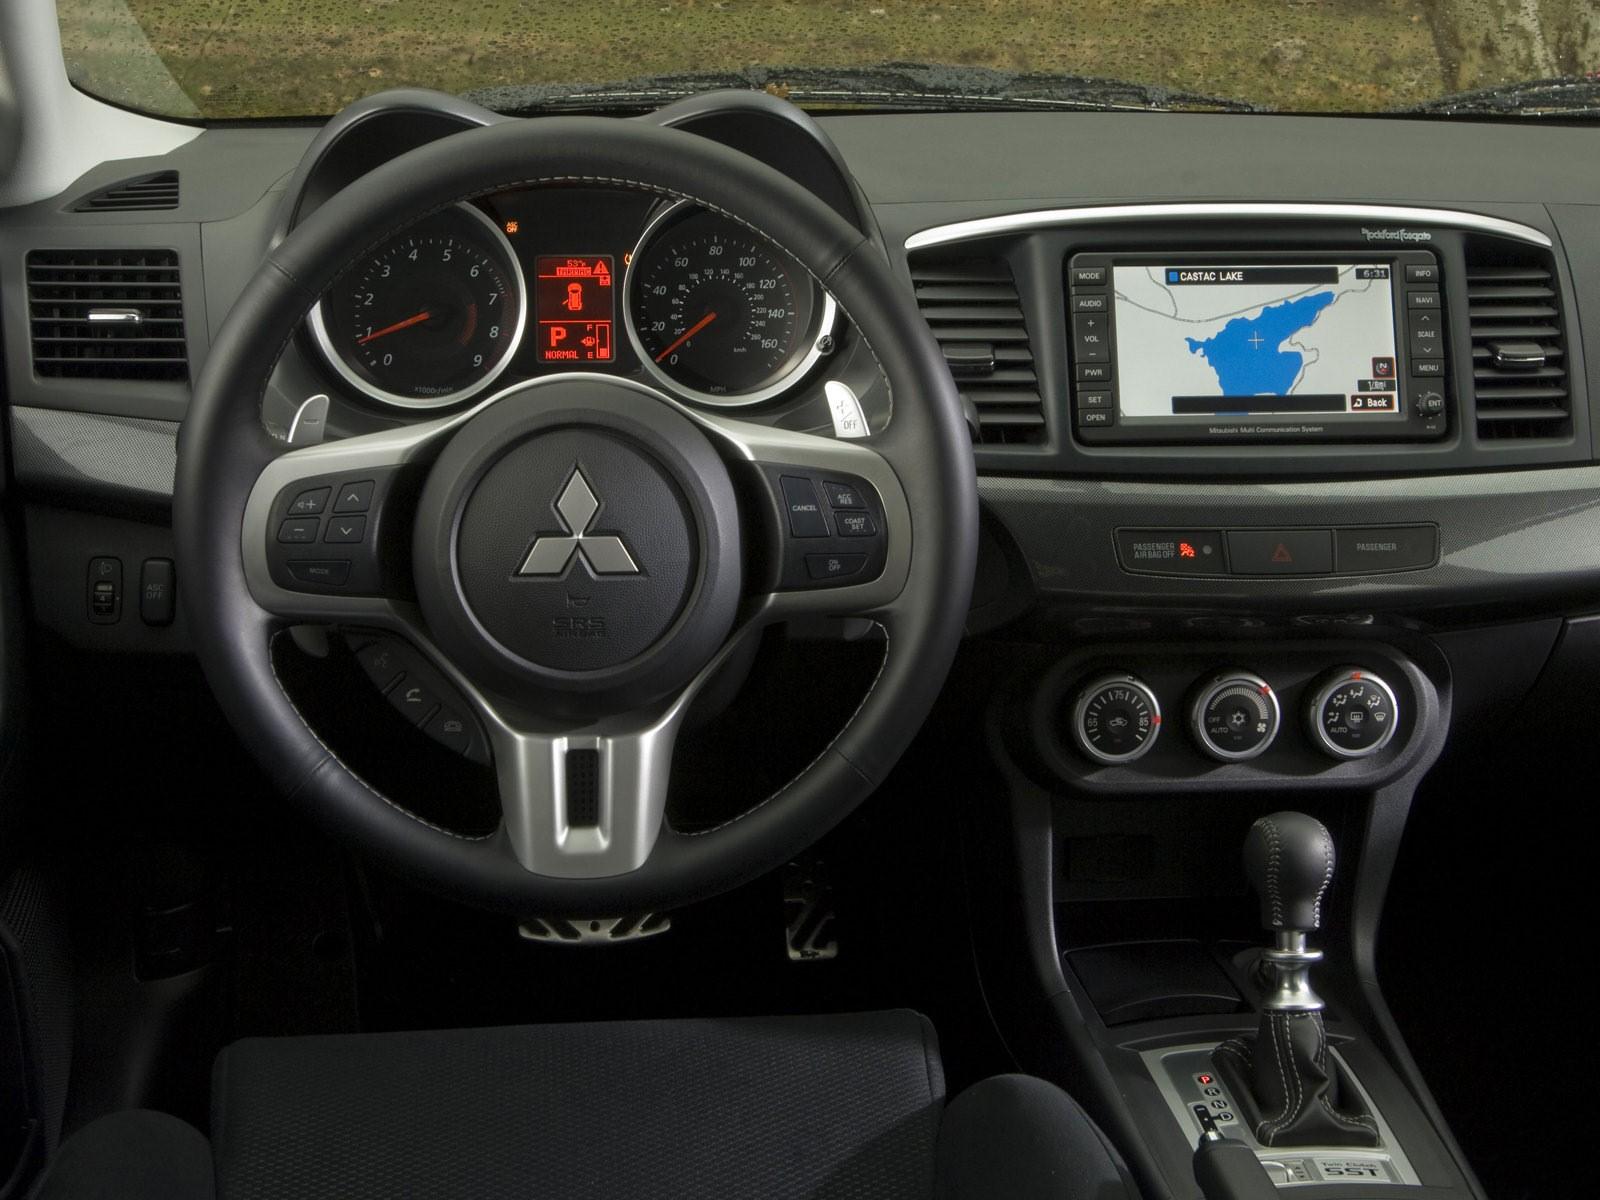 Mitsubishi Lancer Ralliart X 2008 - 2011 Hatchback 5 door #7